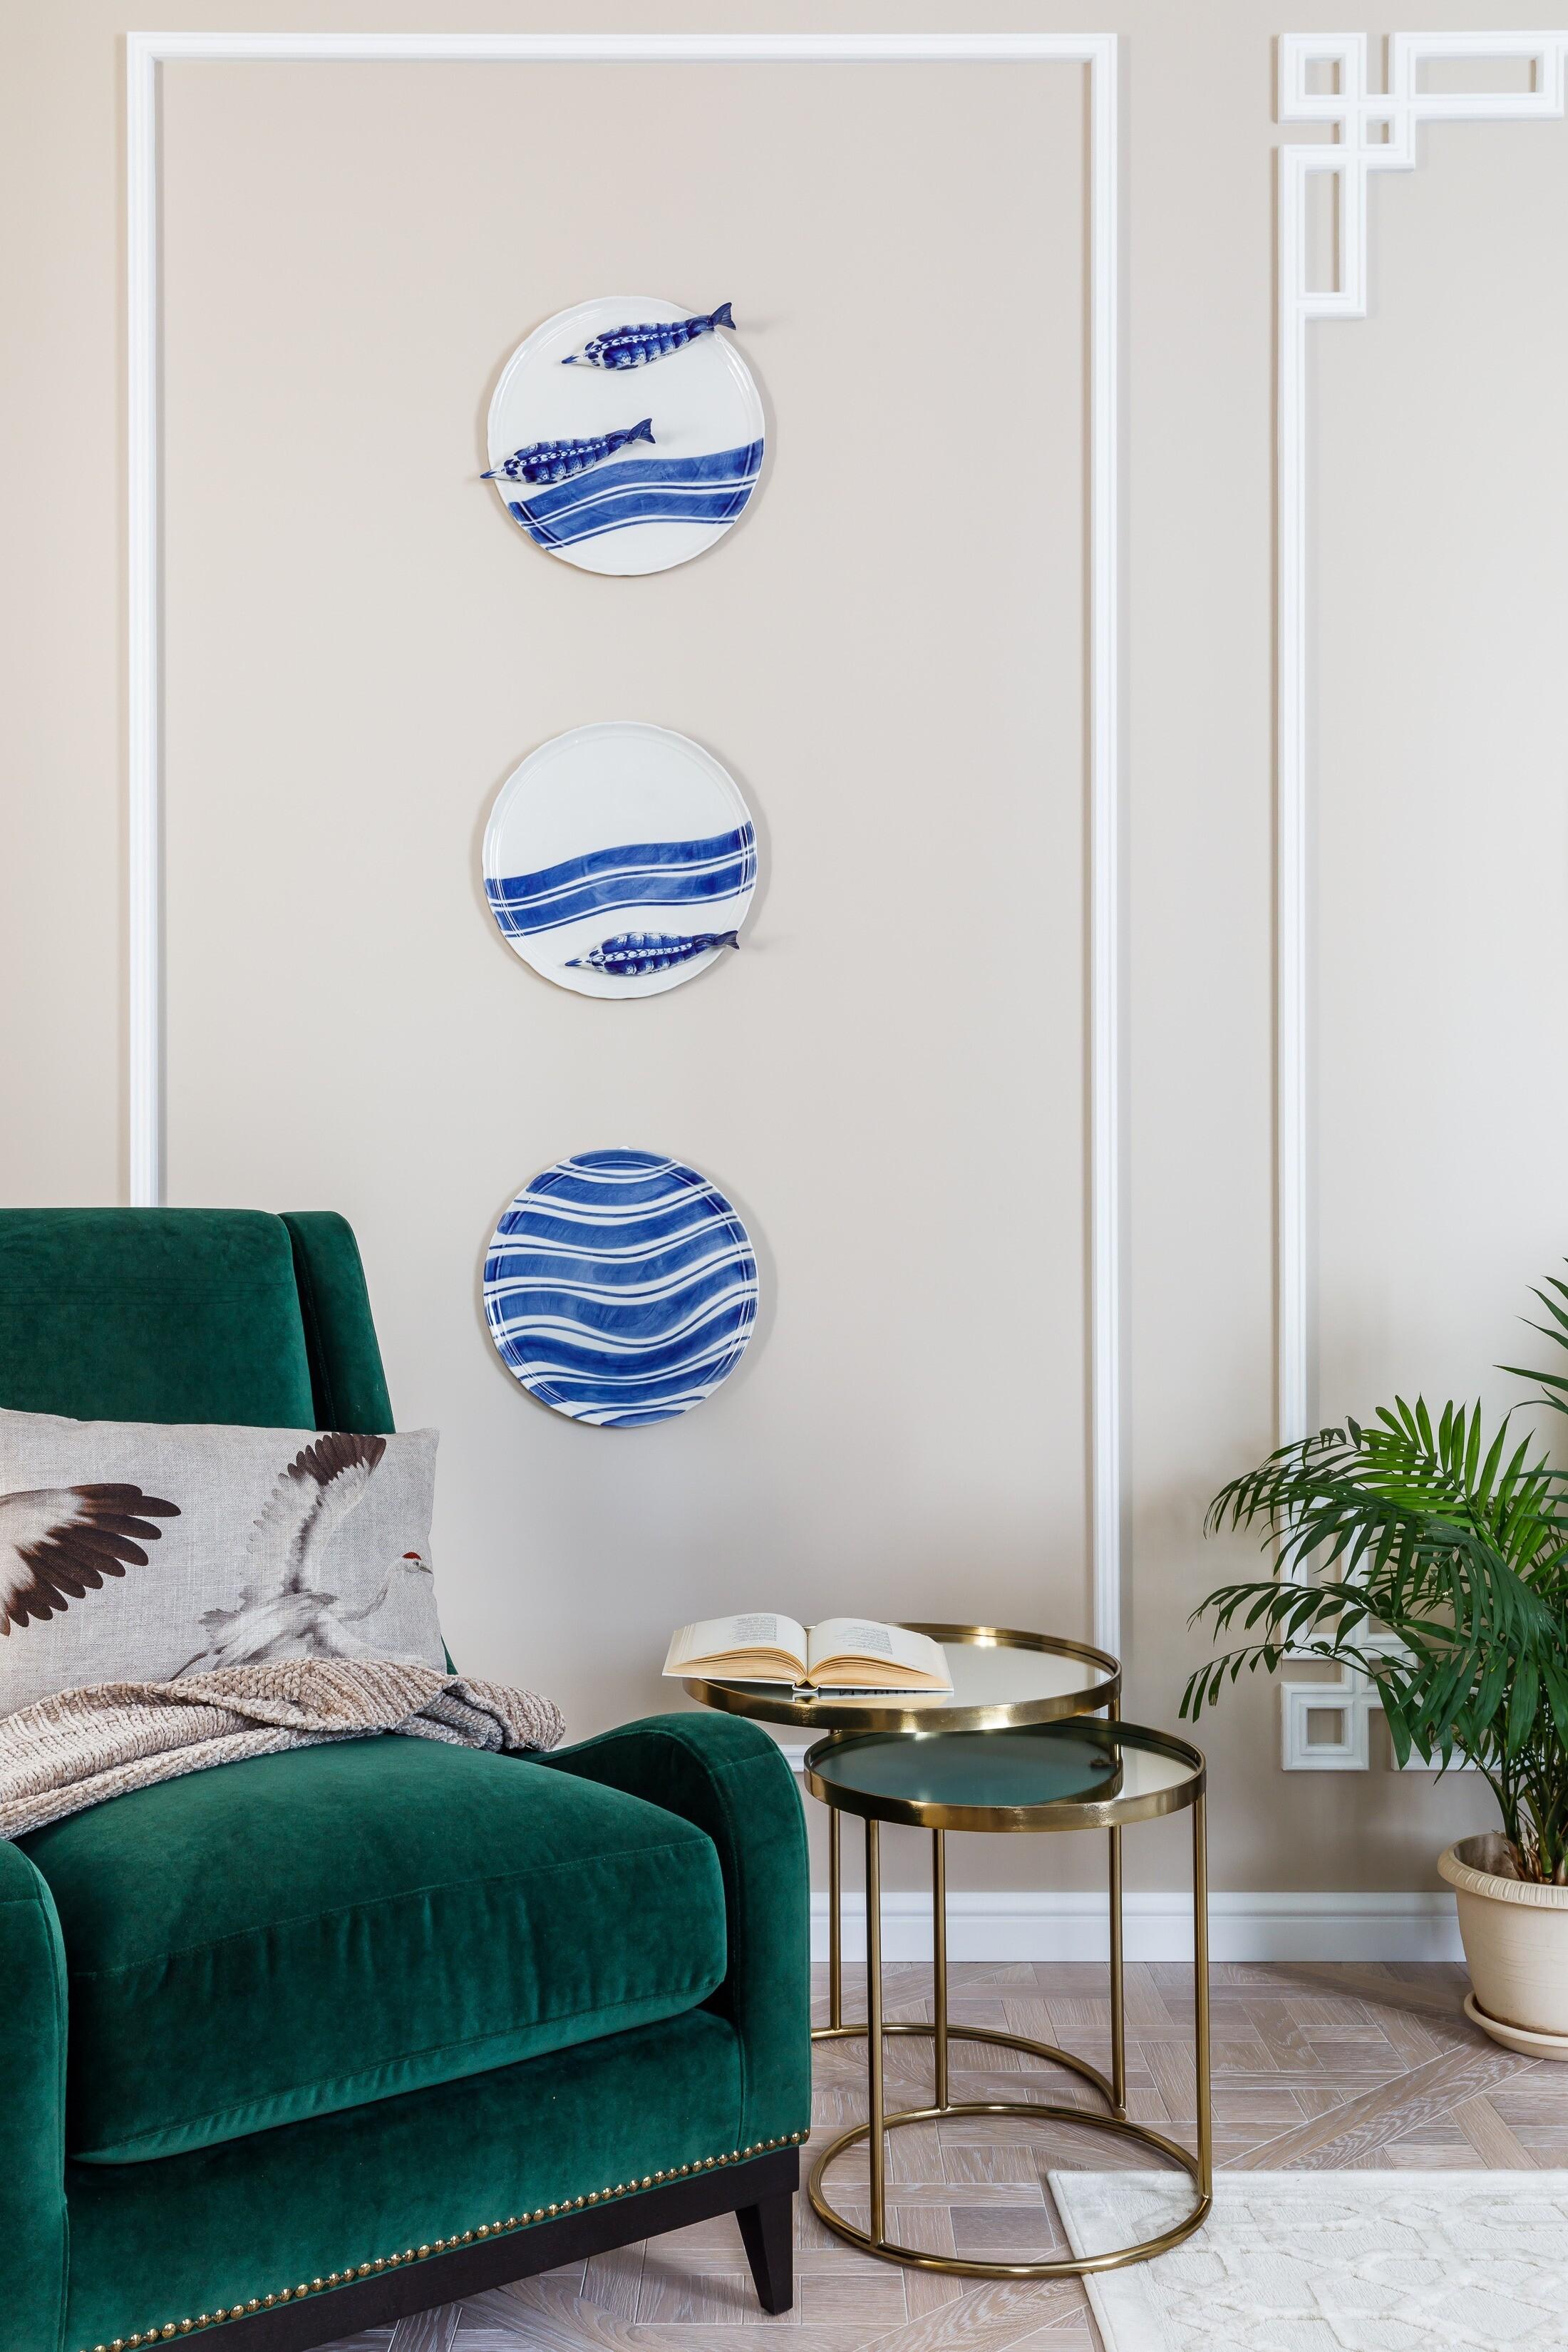 Тарелки на стене — Гжельский фа...